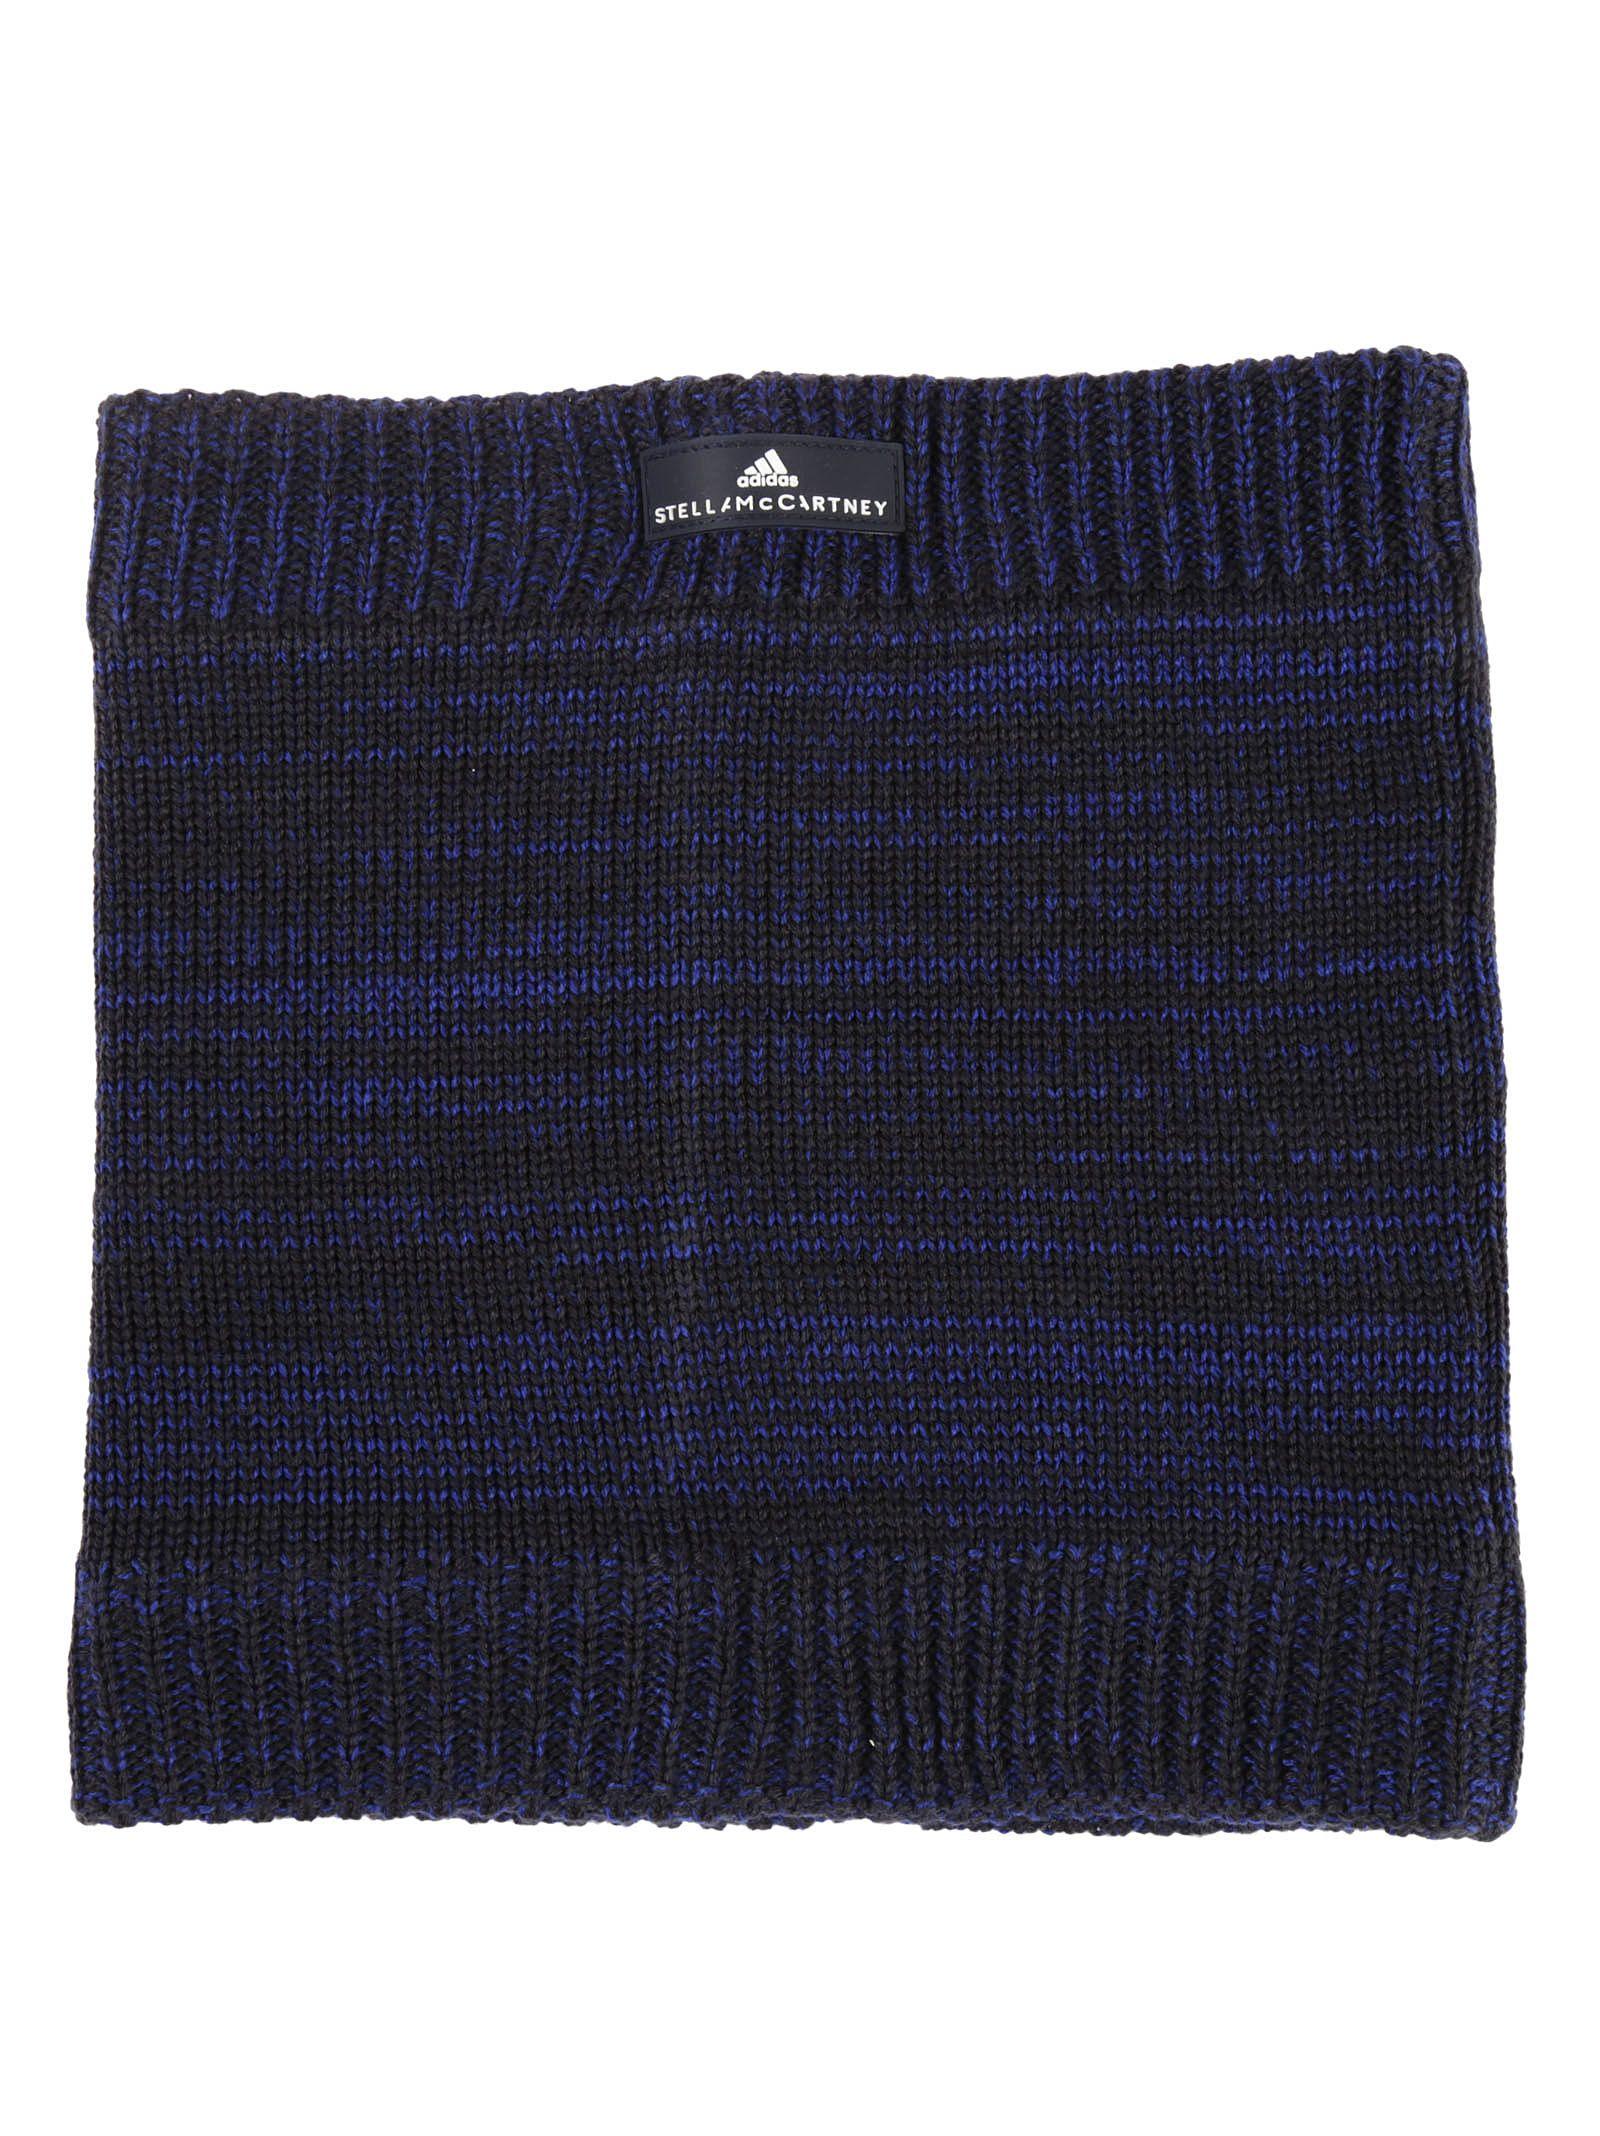 Adidas By Stella McCartney Essentials Neck Warmer